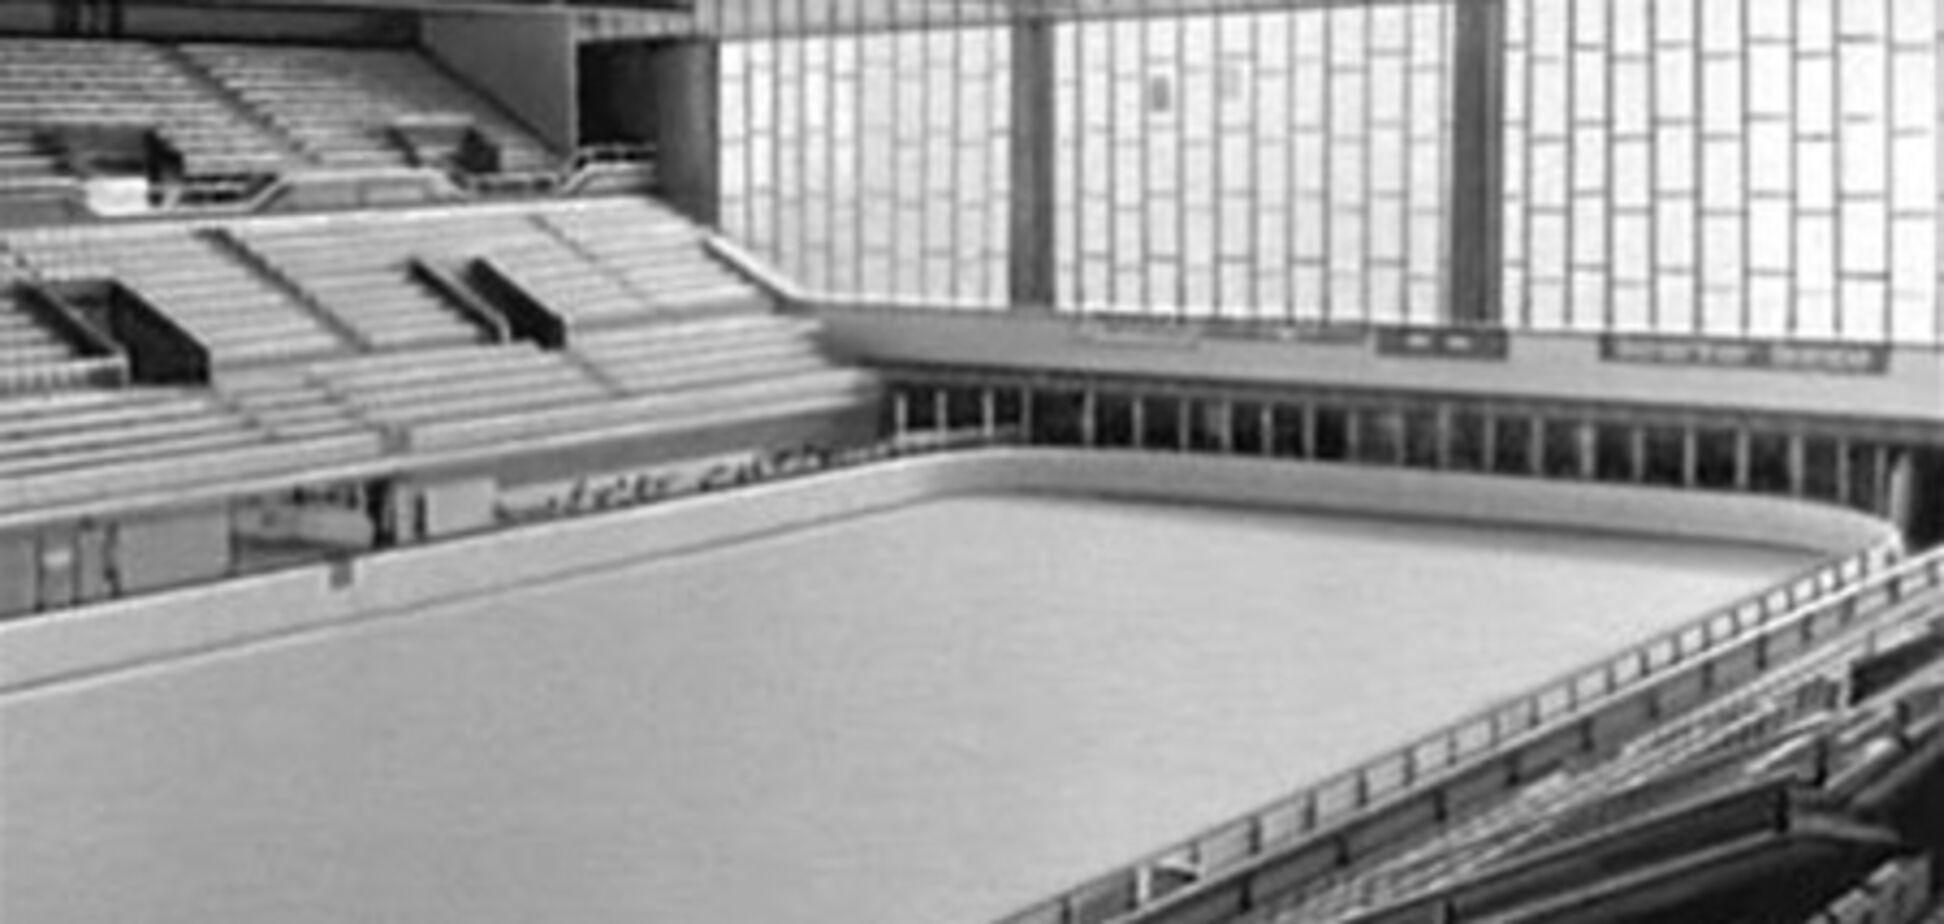 В столице построят ледовый стадион за 8 млн грн